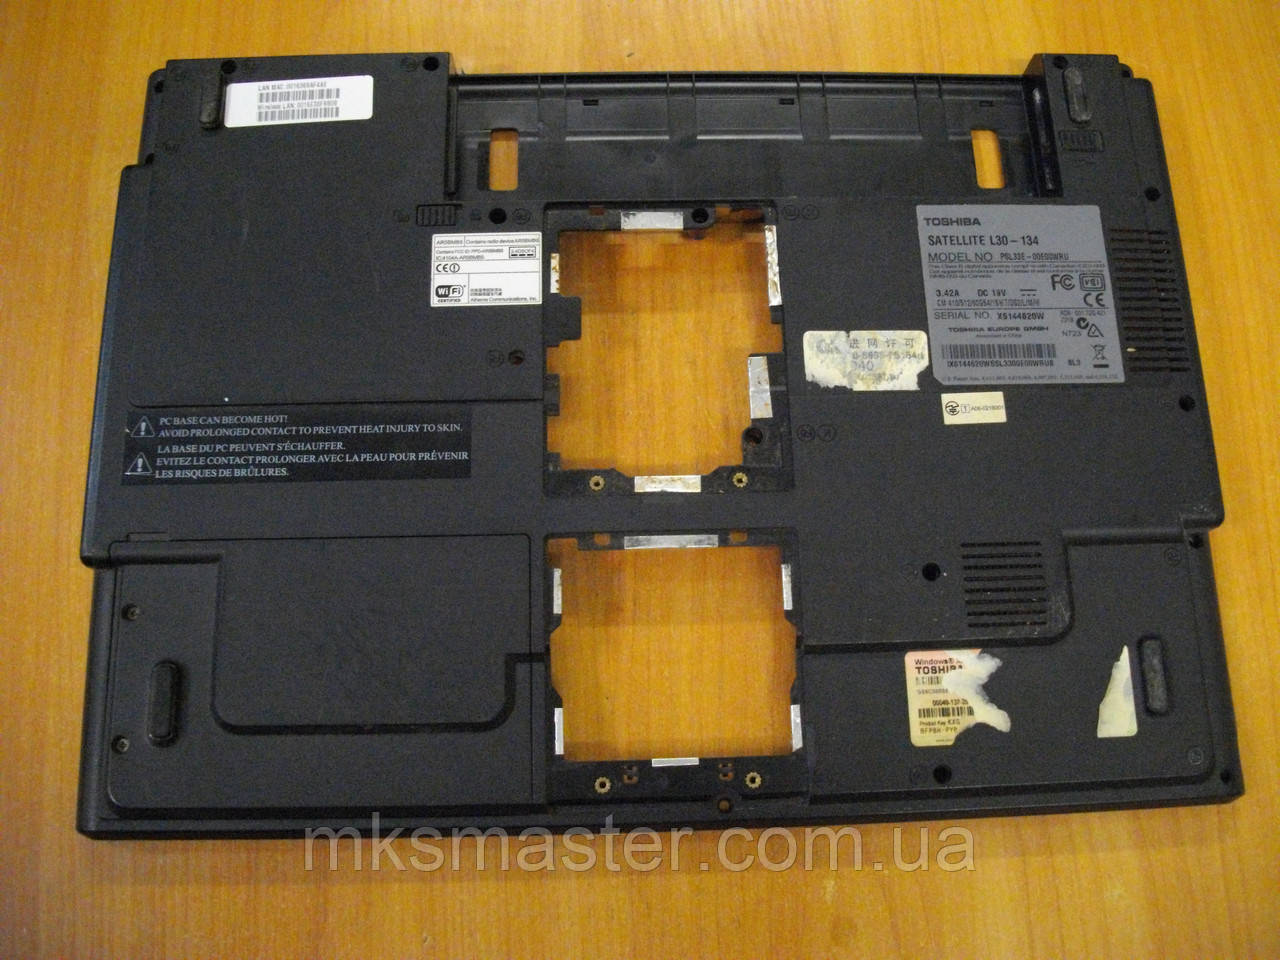 Корпус низ Нижня частина корпусу Toshiba L30-134 PSL33E-00E00WRU бу